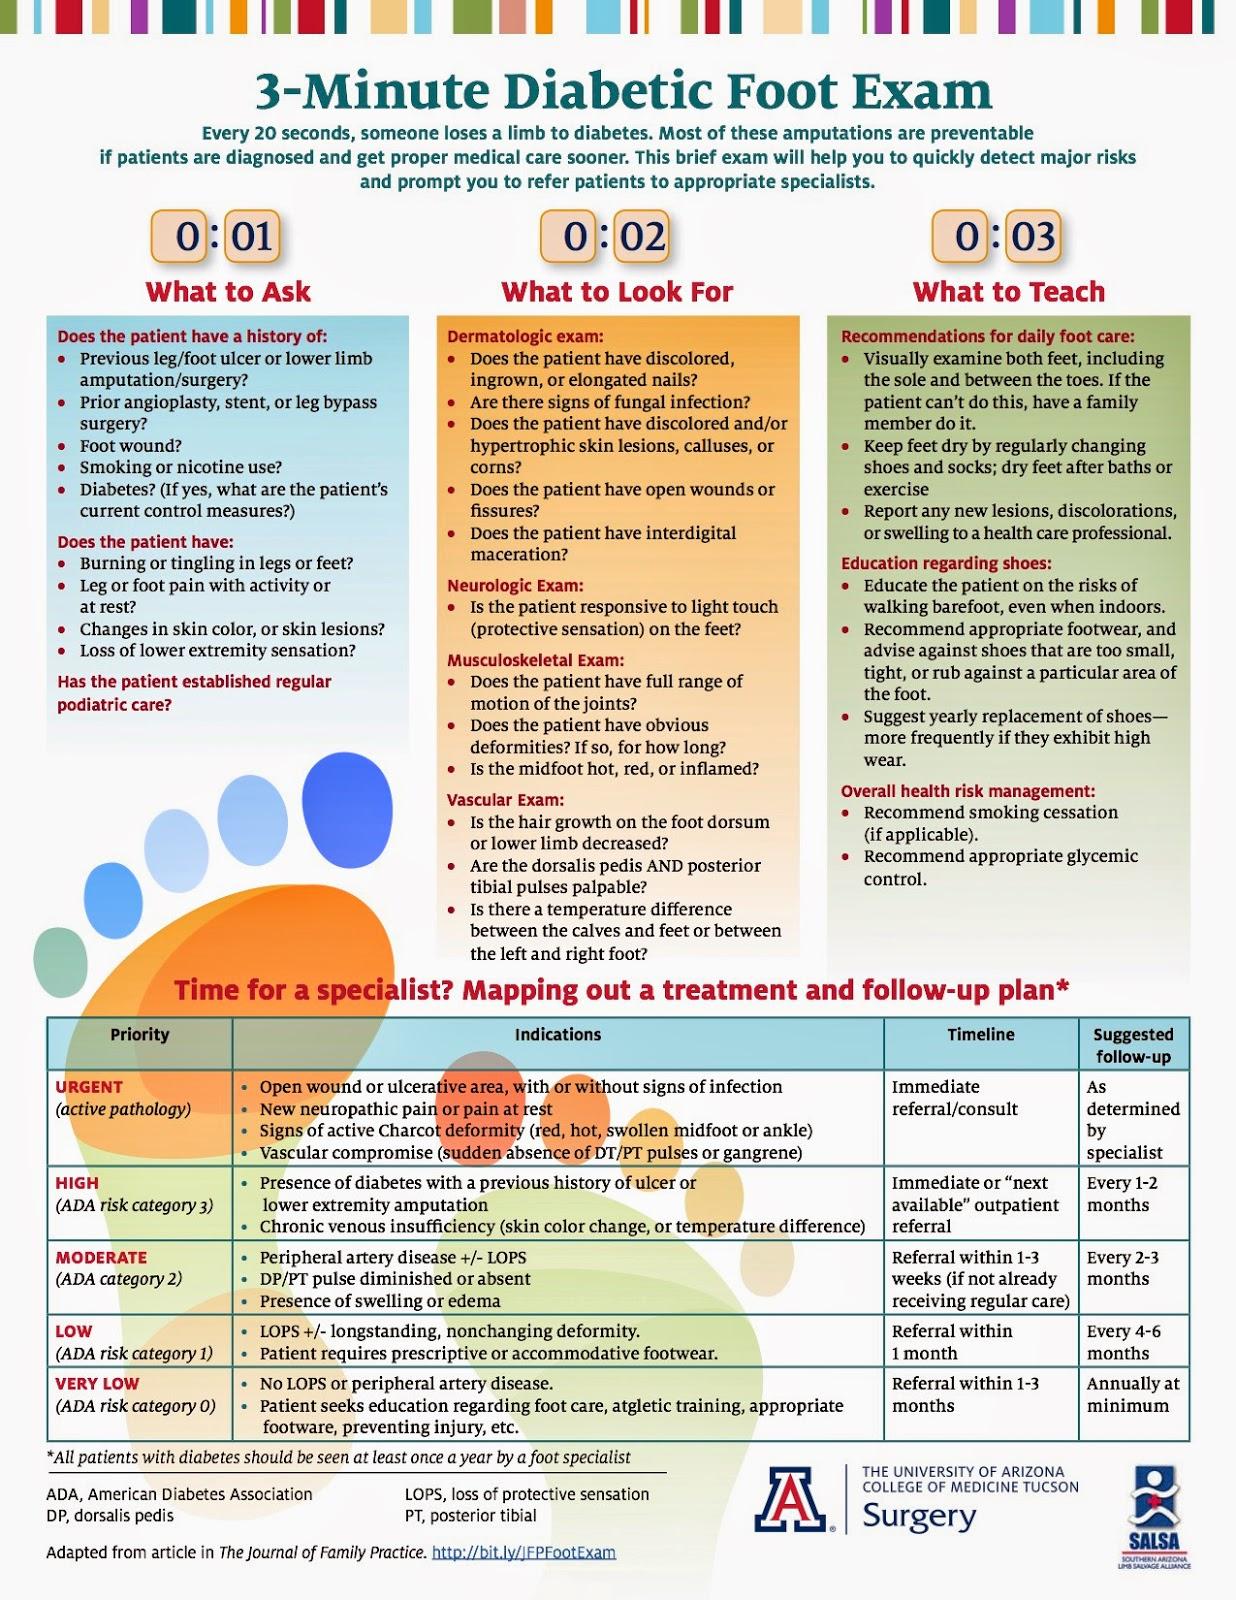 The 3 Minute Diabetic Foot Exam